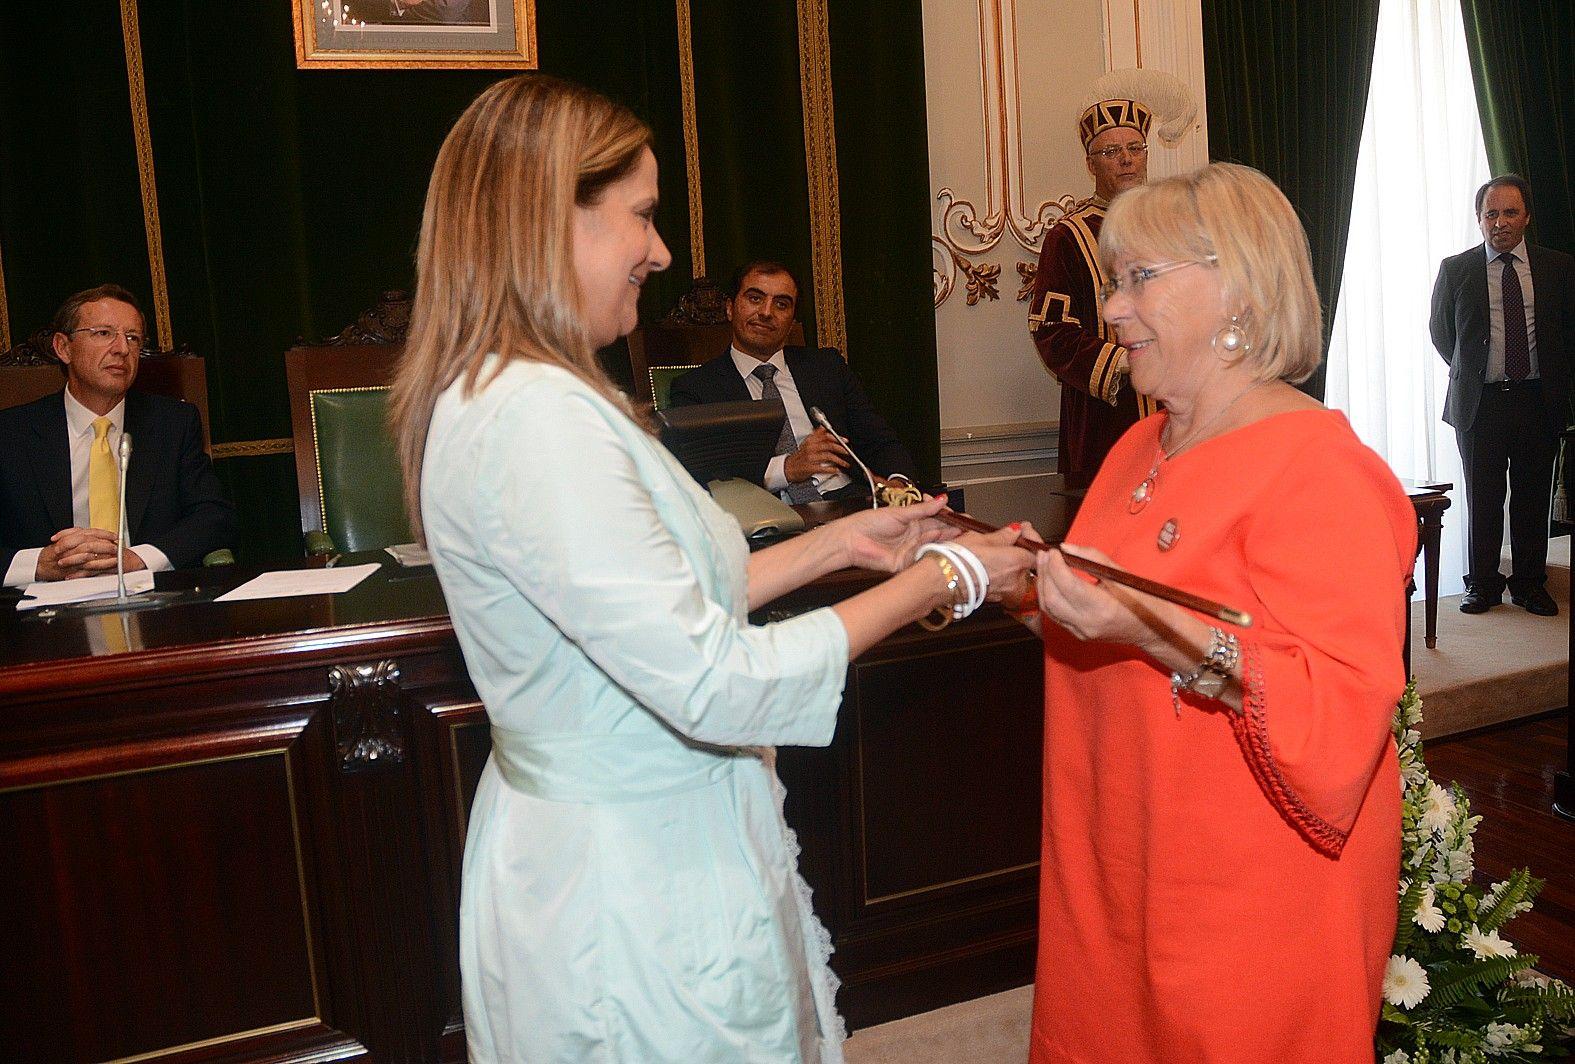 Abelairas con la actual presidenta de la Diputación de Pontevedra, Carmela Silva. Rafa Vázquez.jpg